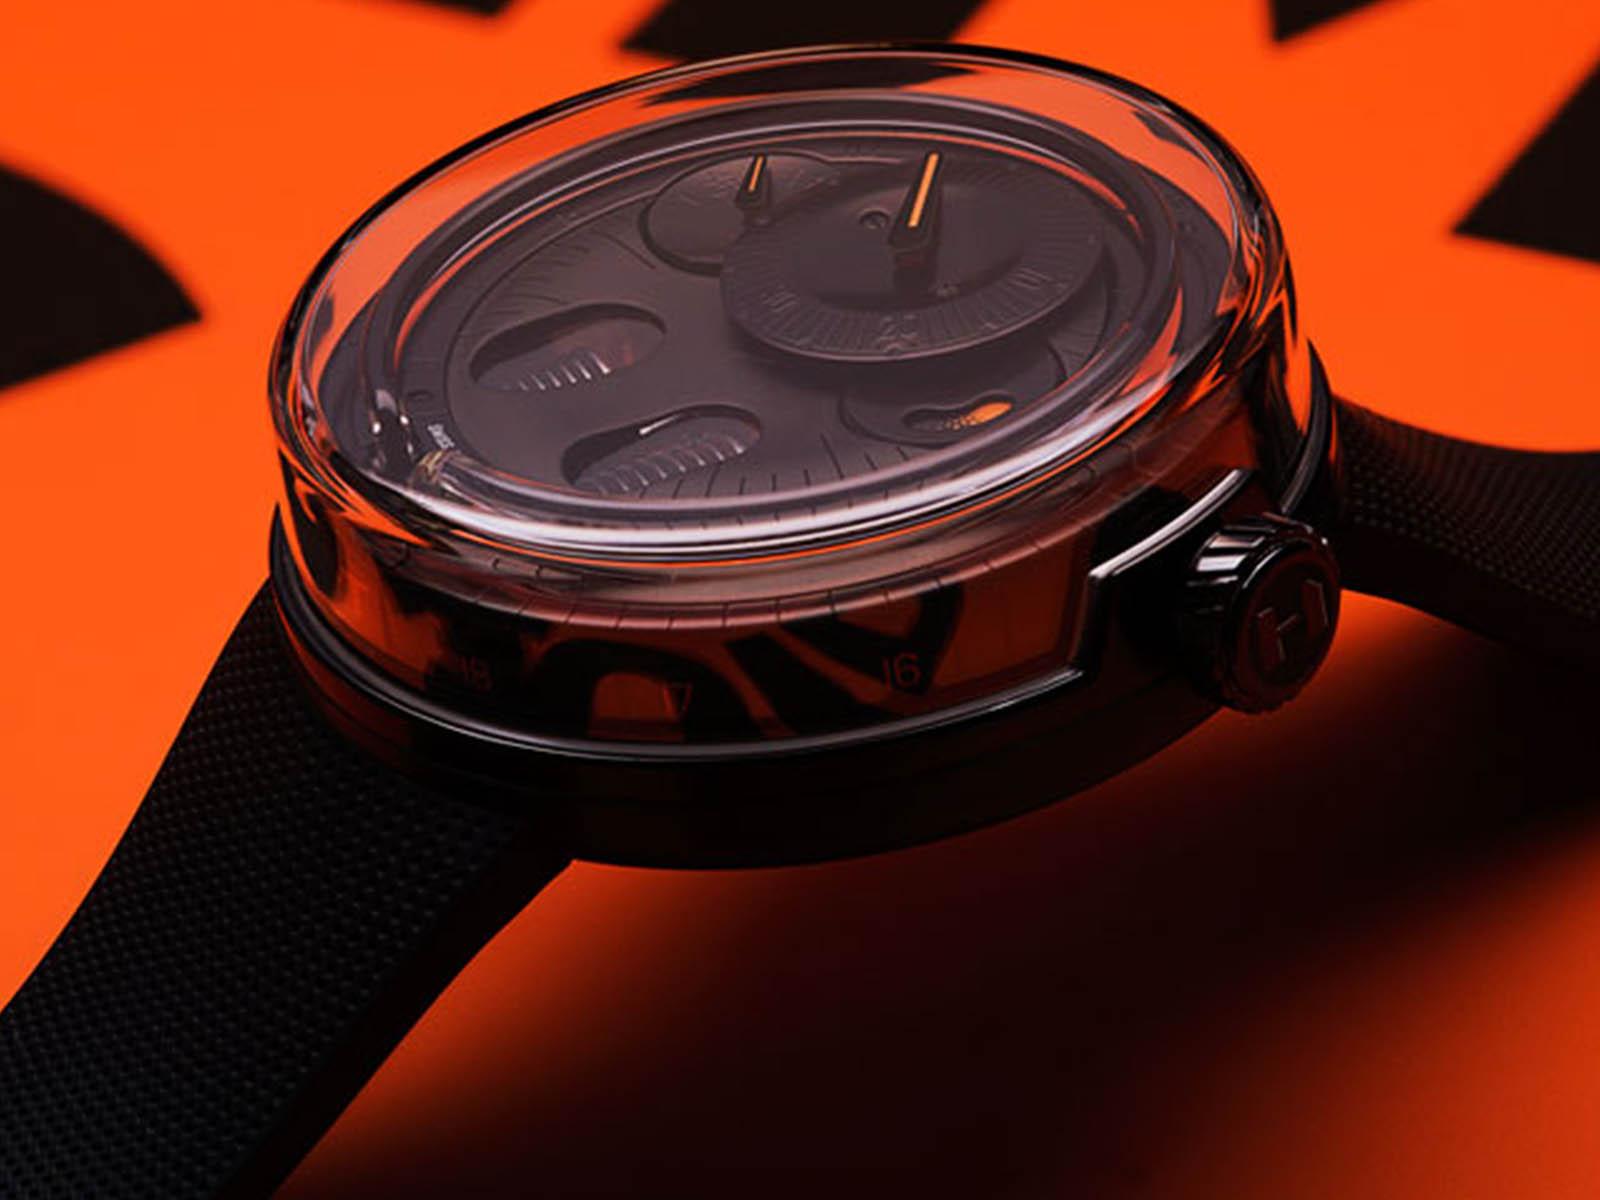 h02387-hyt-h0-black-orange-3.jpg